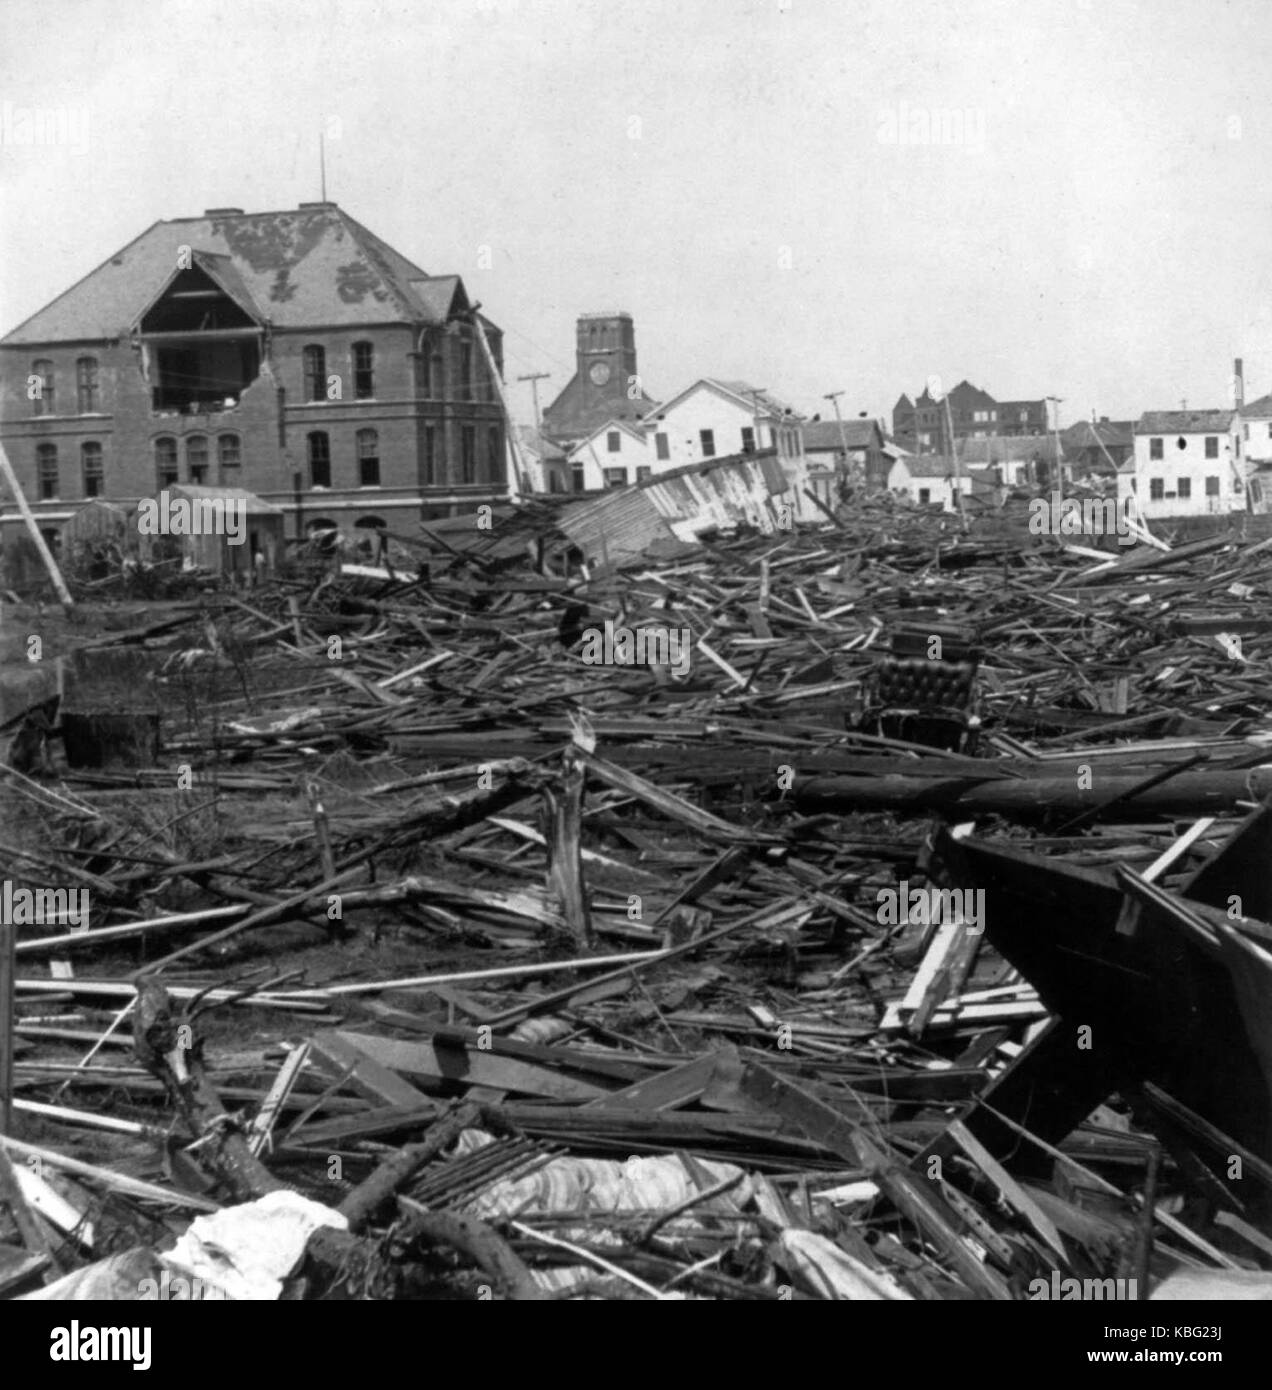 Wrecked Segregated High School building 1900 Galveston hurricane - Stock Image